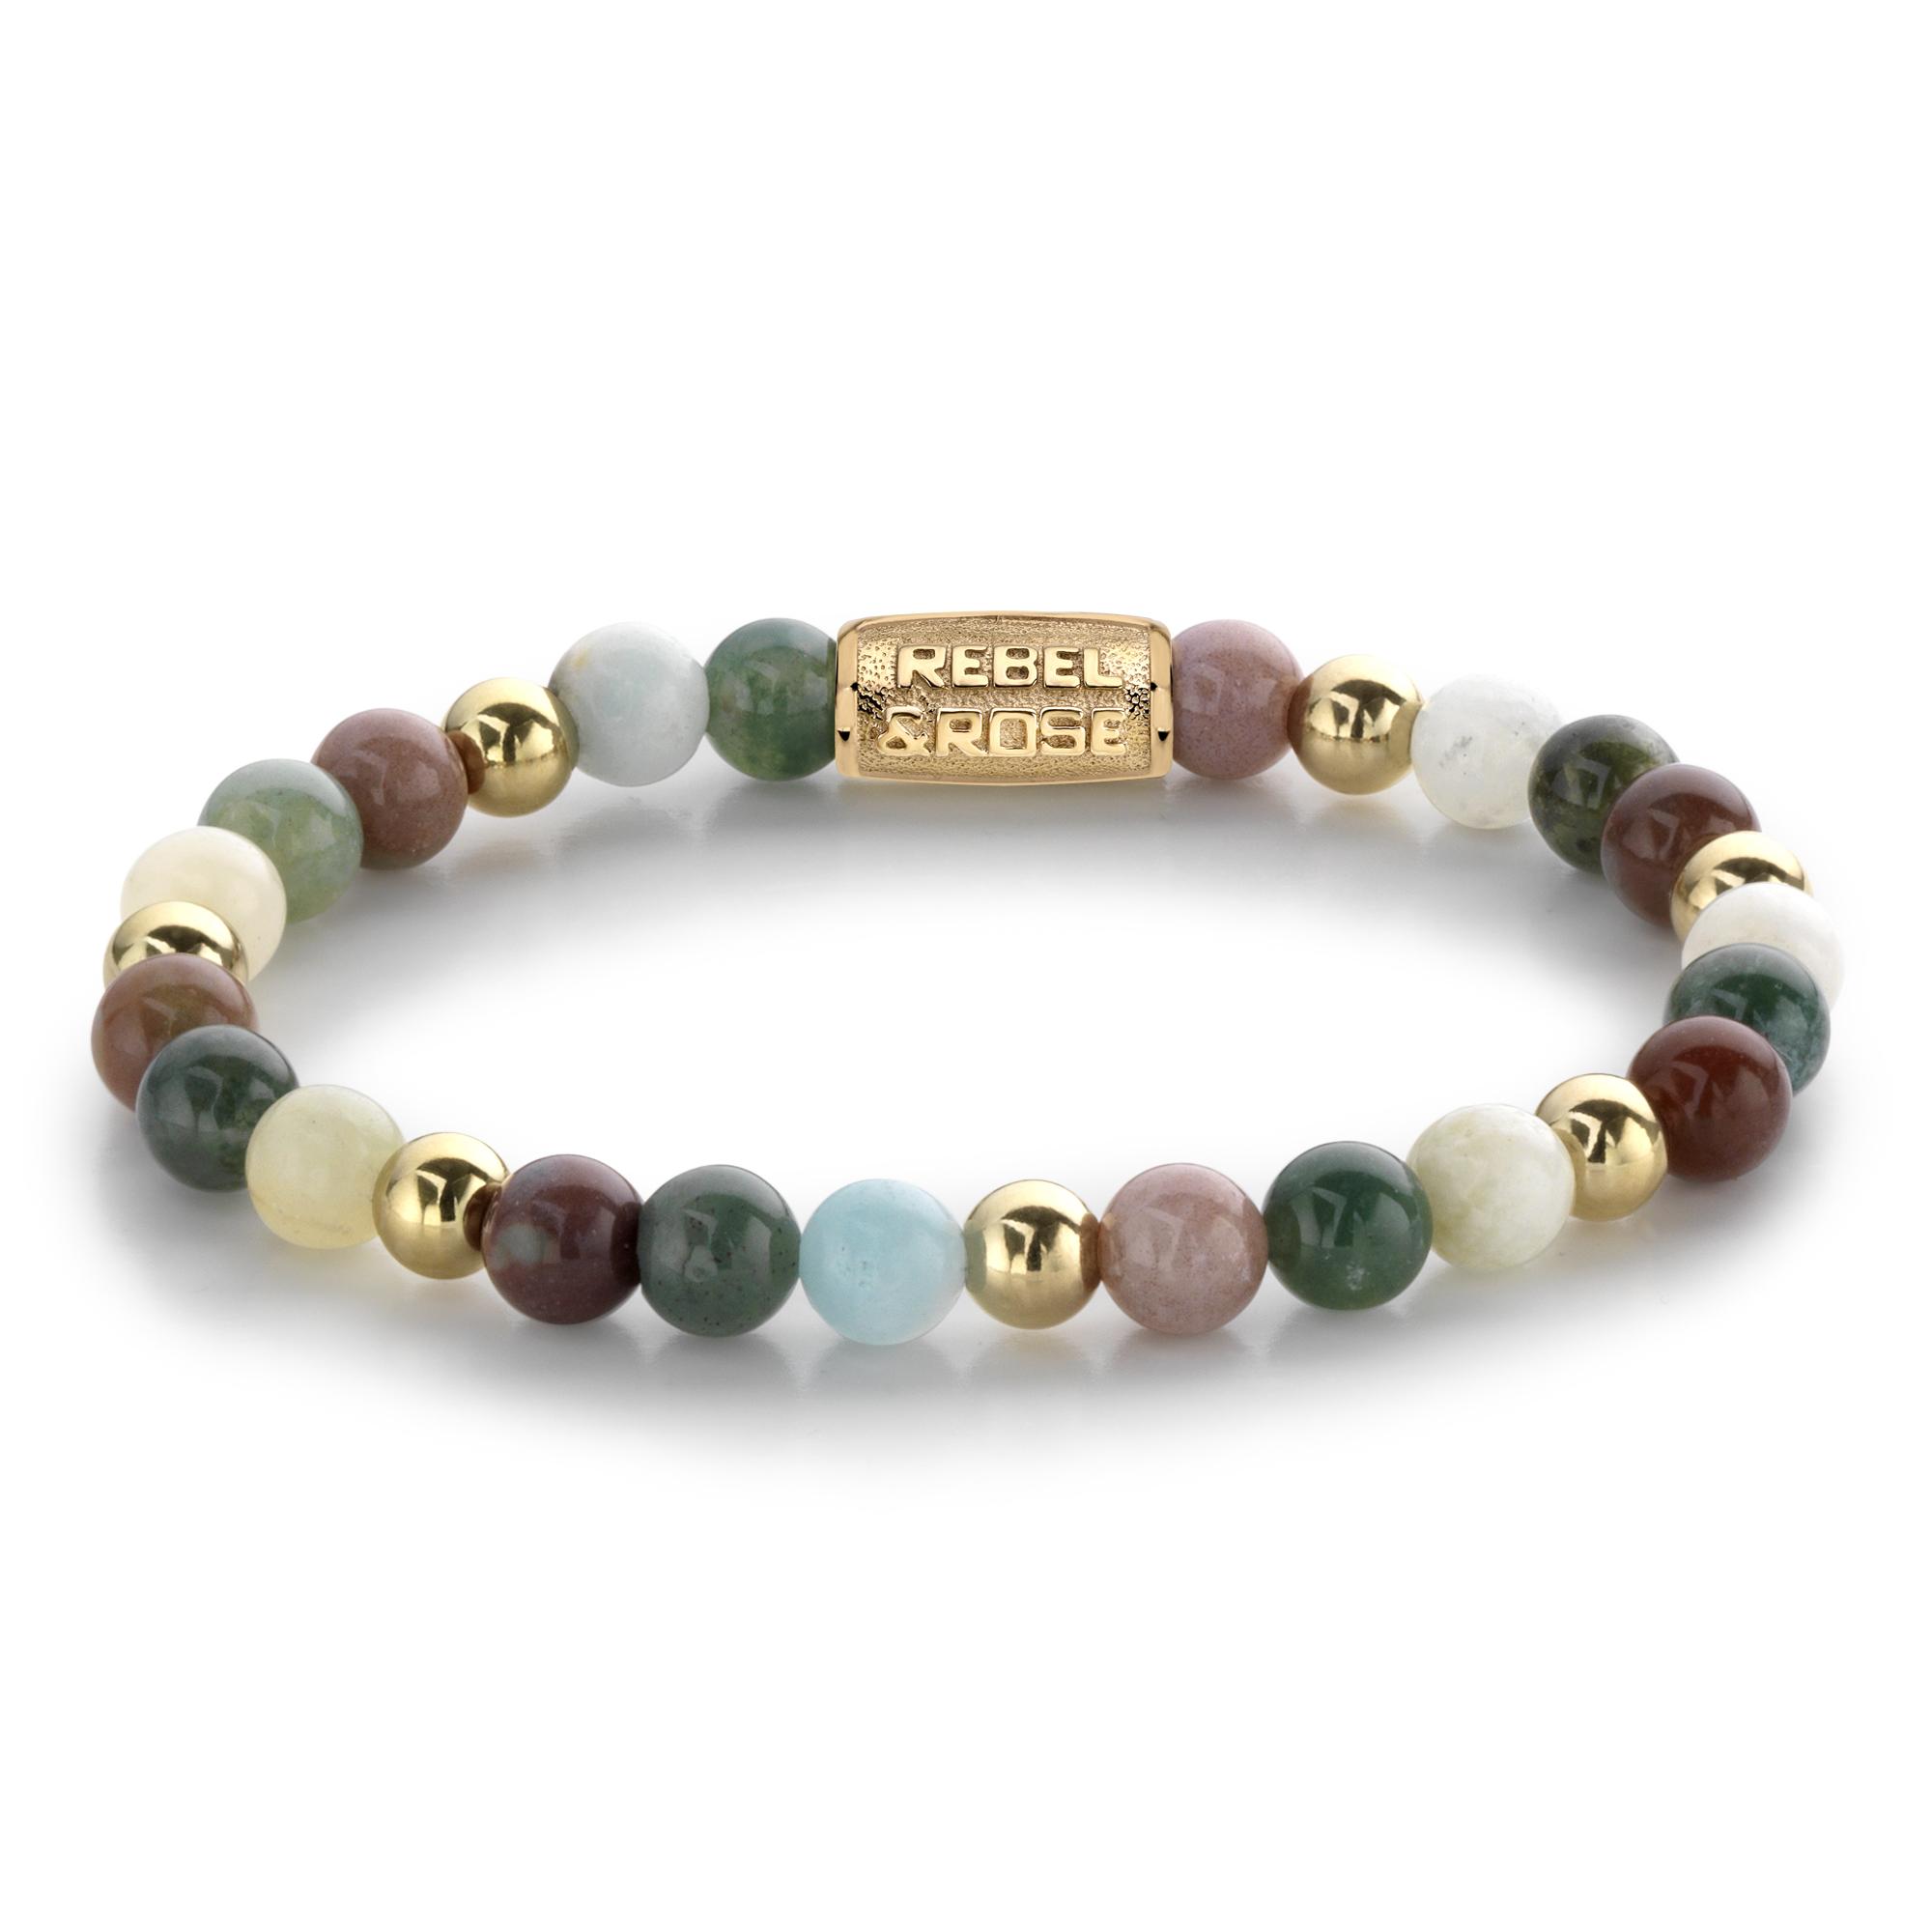 Rebel and Rose RR 60077 G Rekarmband Beads Spring Shine meerkleurig goudkleurig 6 mm S 16,5 cm